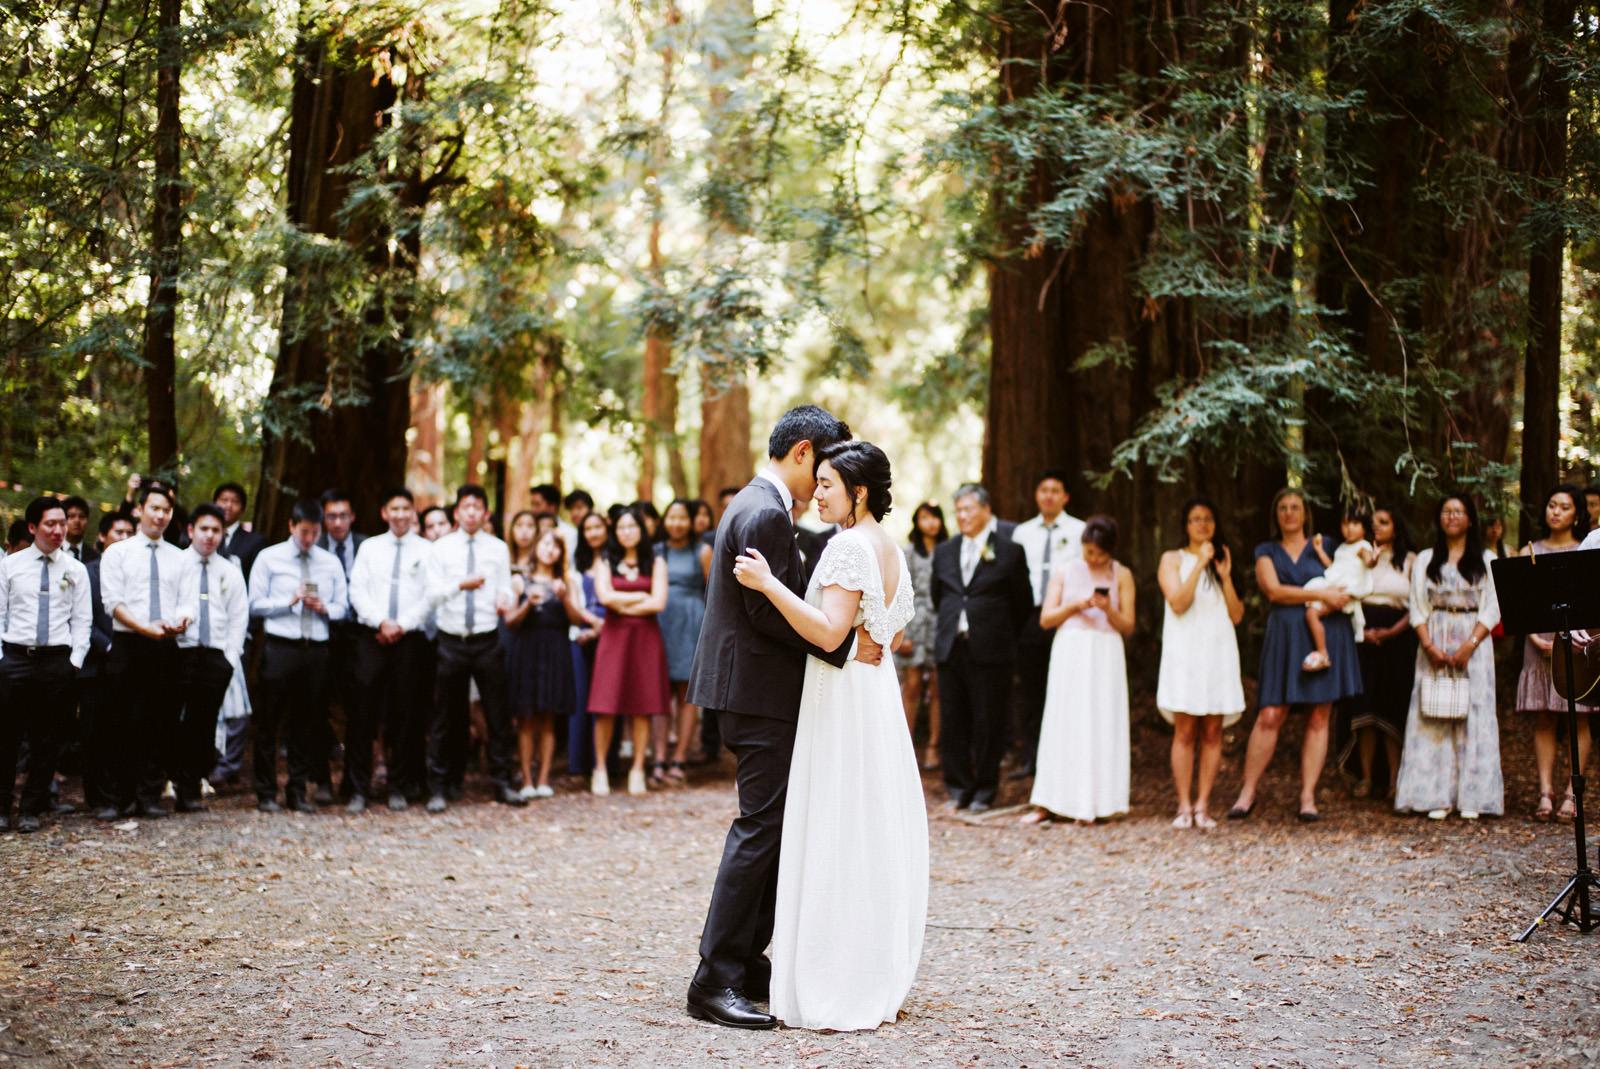 kimclay-blog-073 REDWOOD FOREST WEDDING